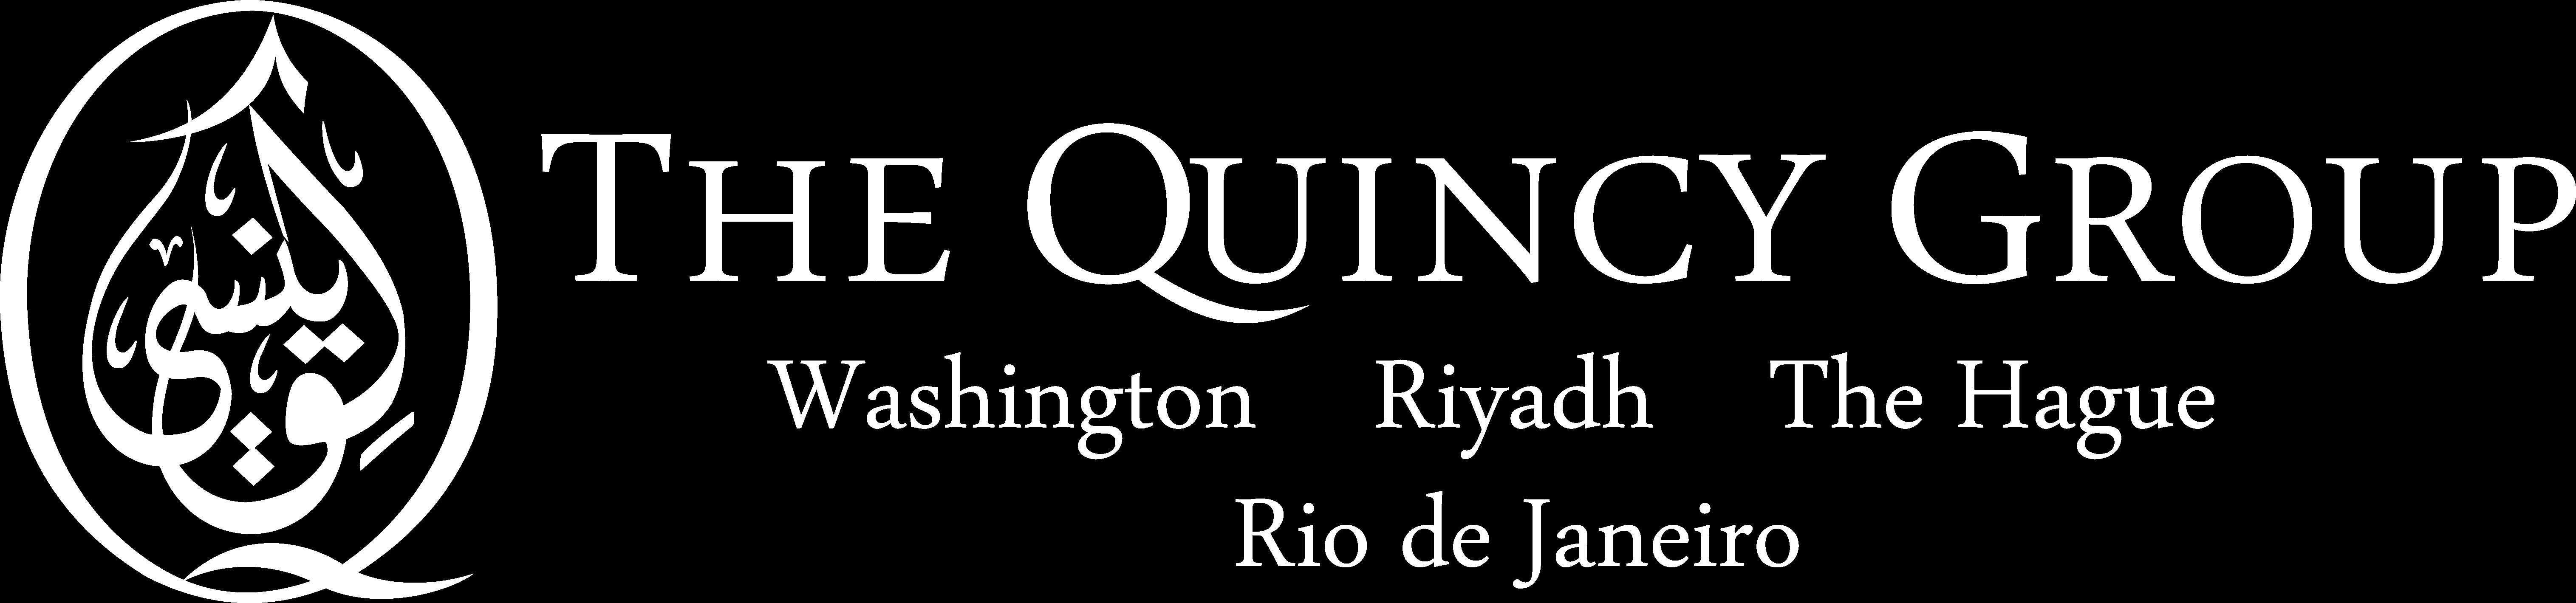 Full Logo 4 Cities White